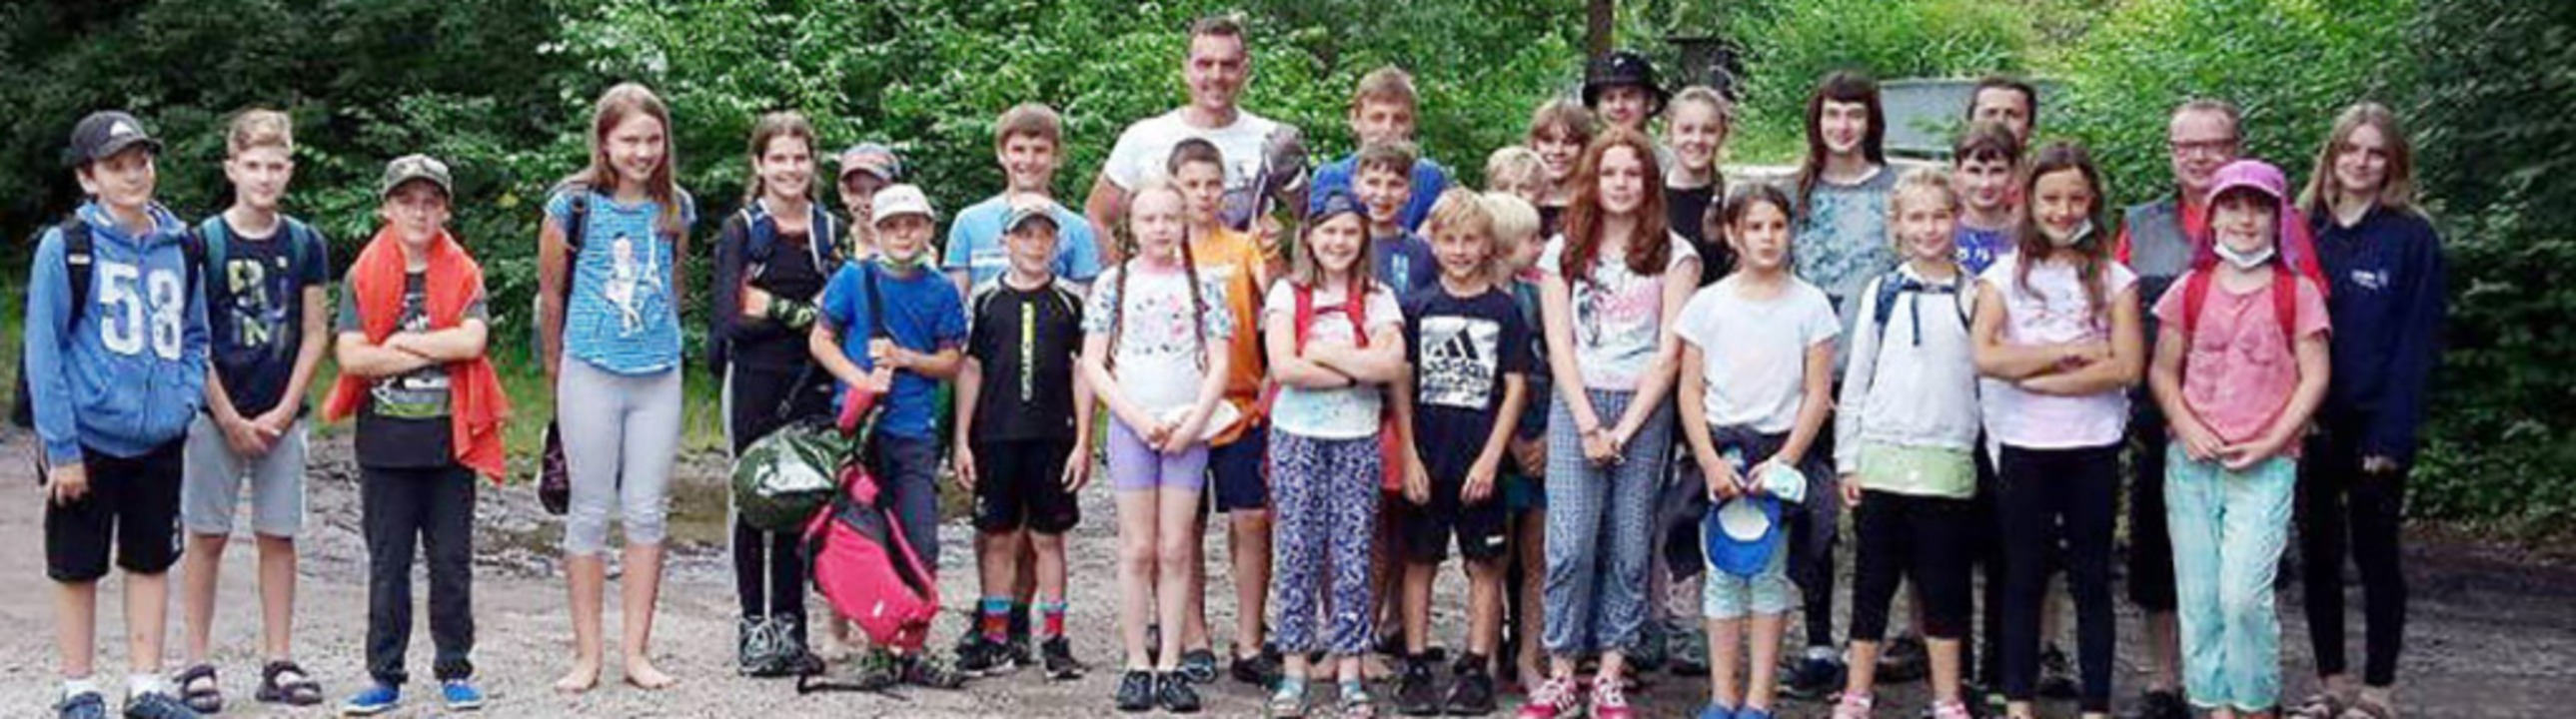 <BZ-FotoAnlauf>Friesenheim: </BZ-FotoA...te. Insgesamt nahmen  30 Kinder teil.     Foto: Gemeinde